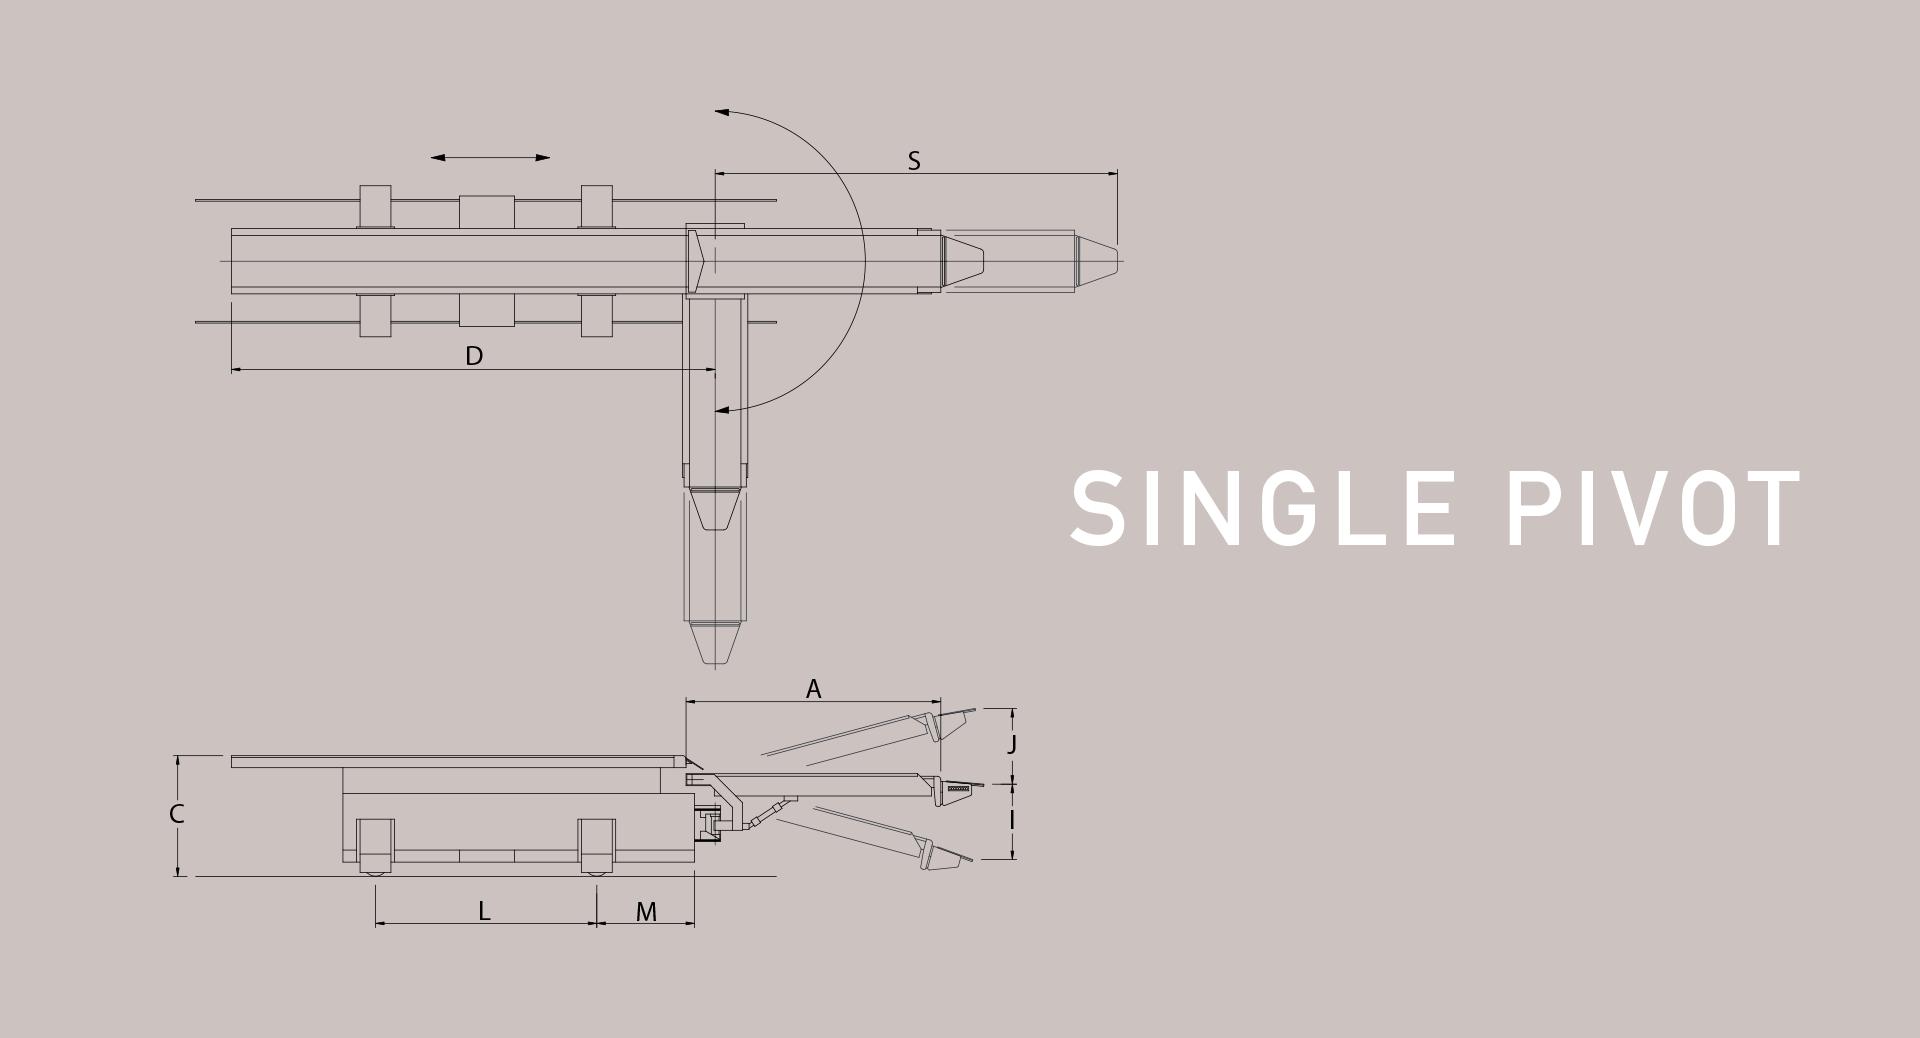 hight resolution of single pivoting railcar loader diagram